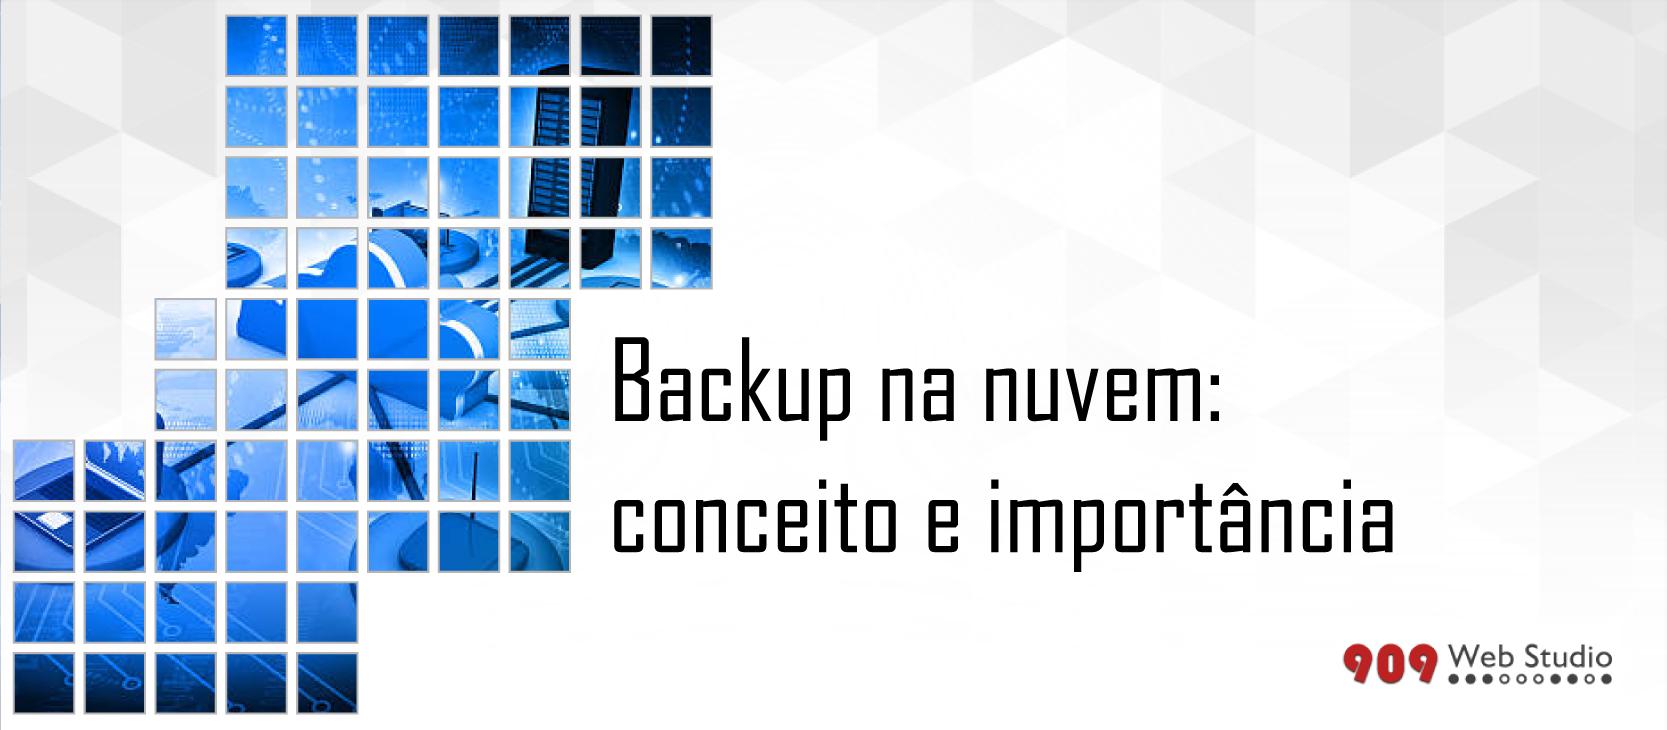 Backup na nuvem: conceito e importância